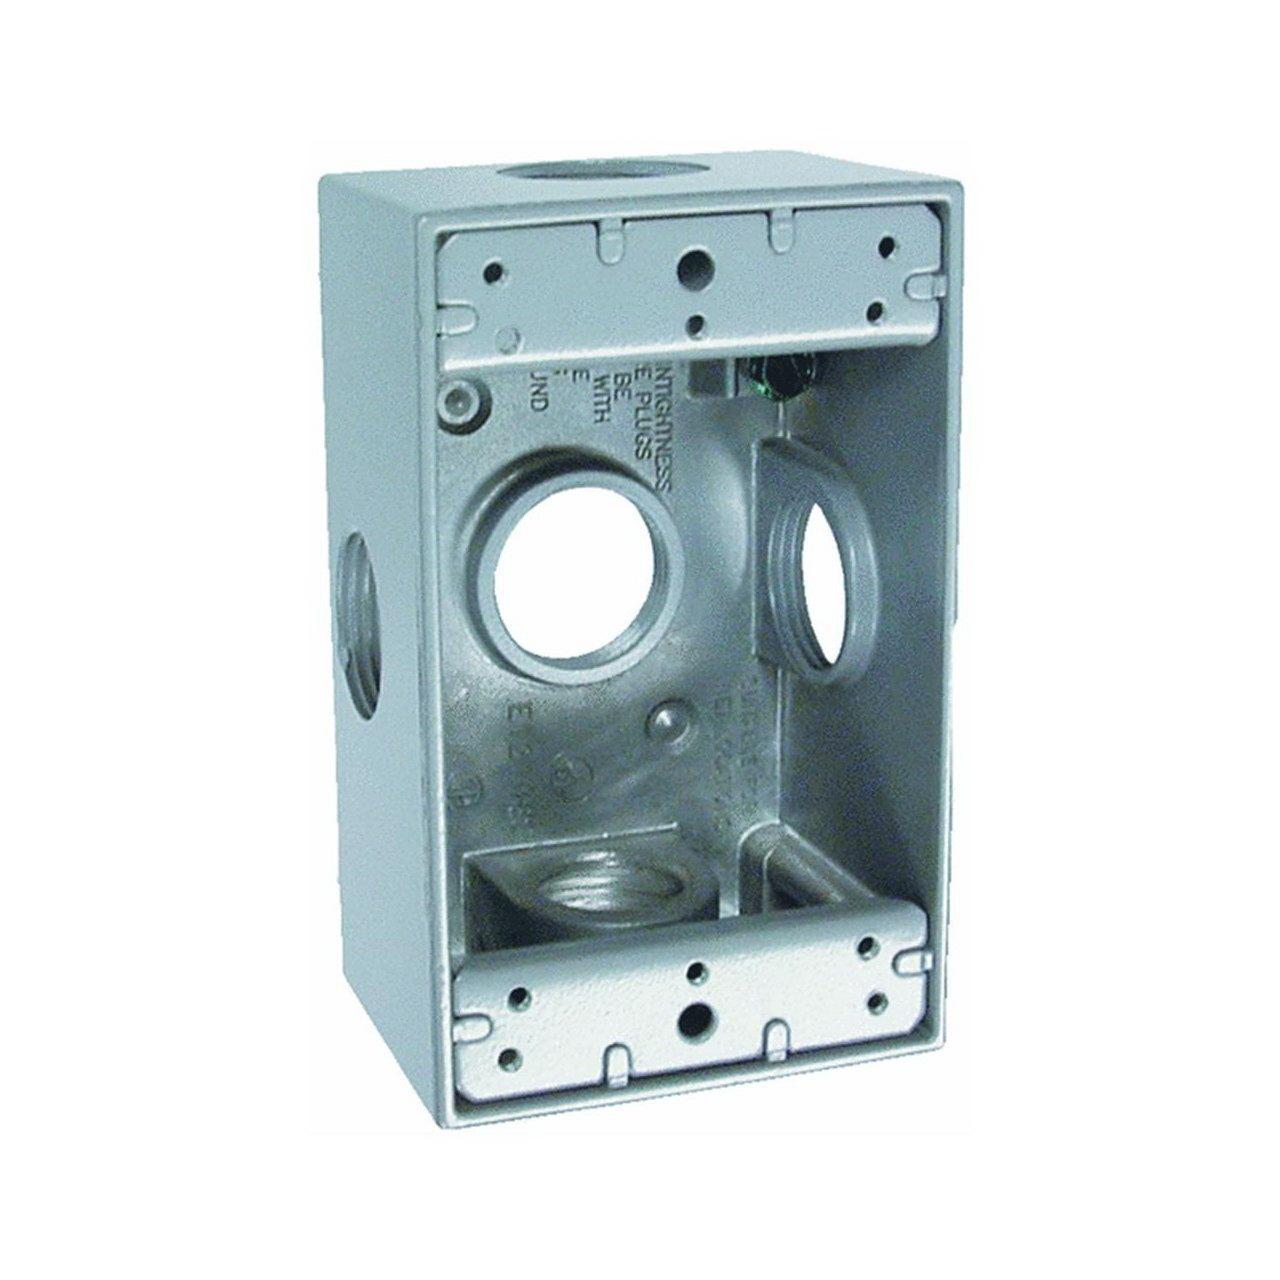 Bell 5332-0 Weatherproof Electrical Box, 1 Gang, 18.3 cu-in, 4-1/2 in L X 2-3/4 in W X 2 in D